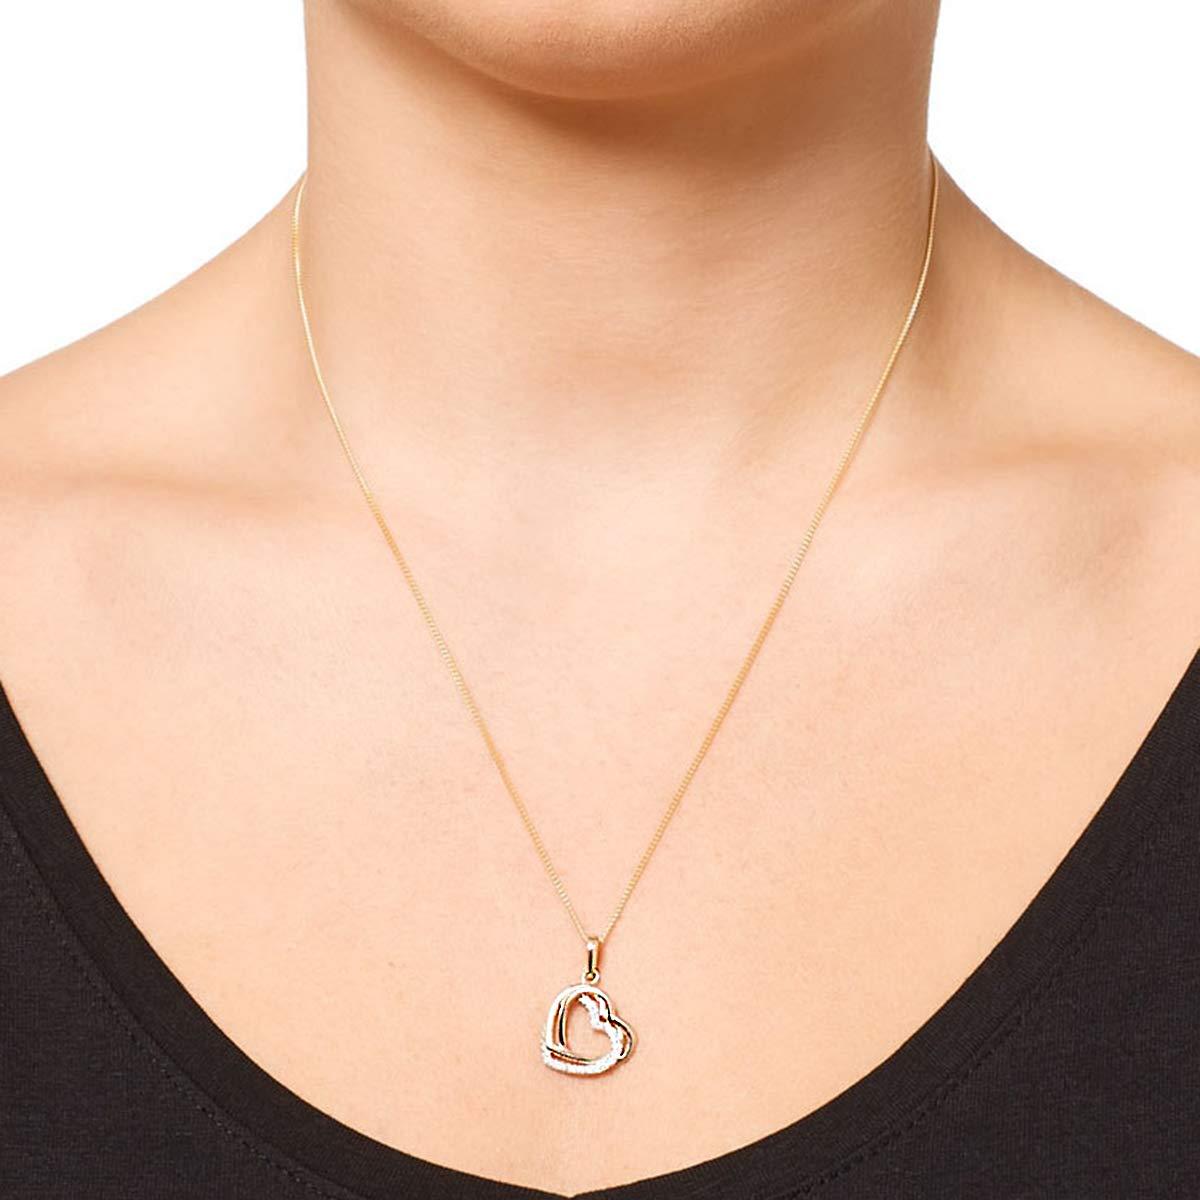 0.25 Ct Round Cut Simulated Diamond 14K Tri-Tone Gold Heart Pendant With 18 Chain .925 Silver